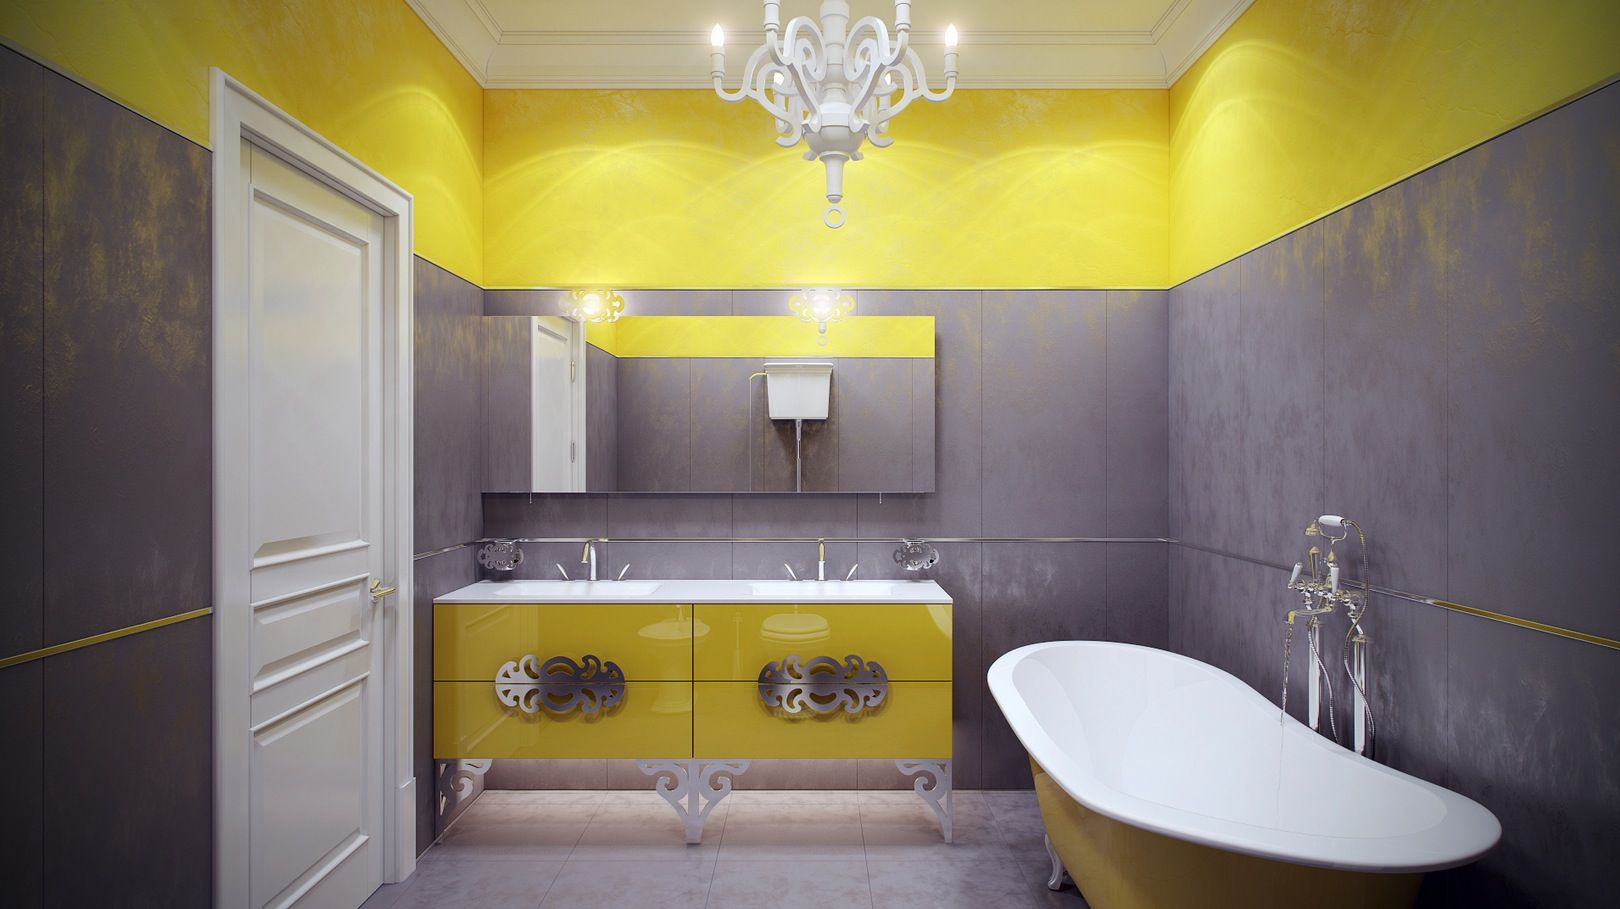 Wandfarbe Gelb Grau